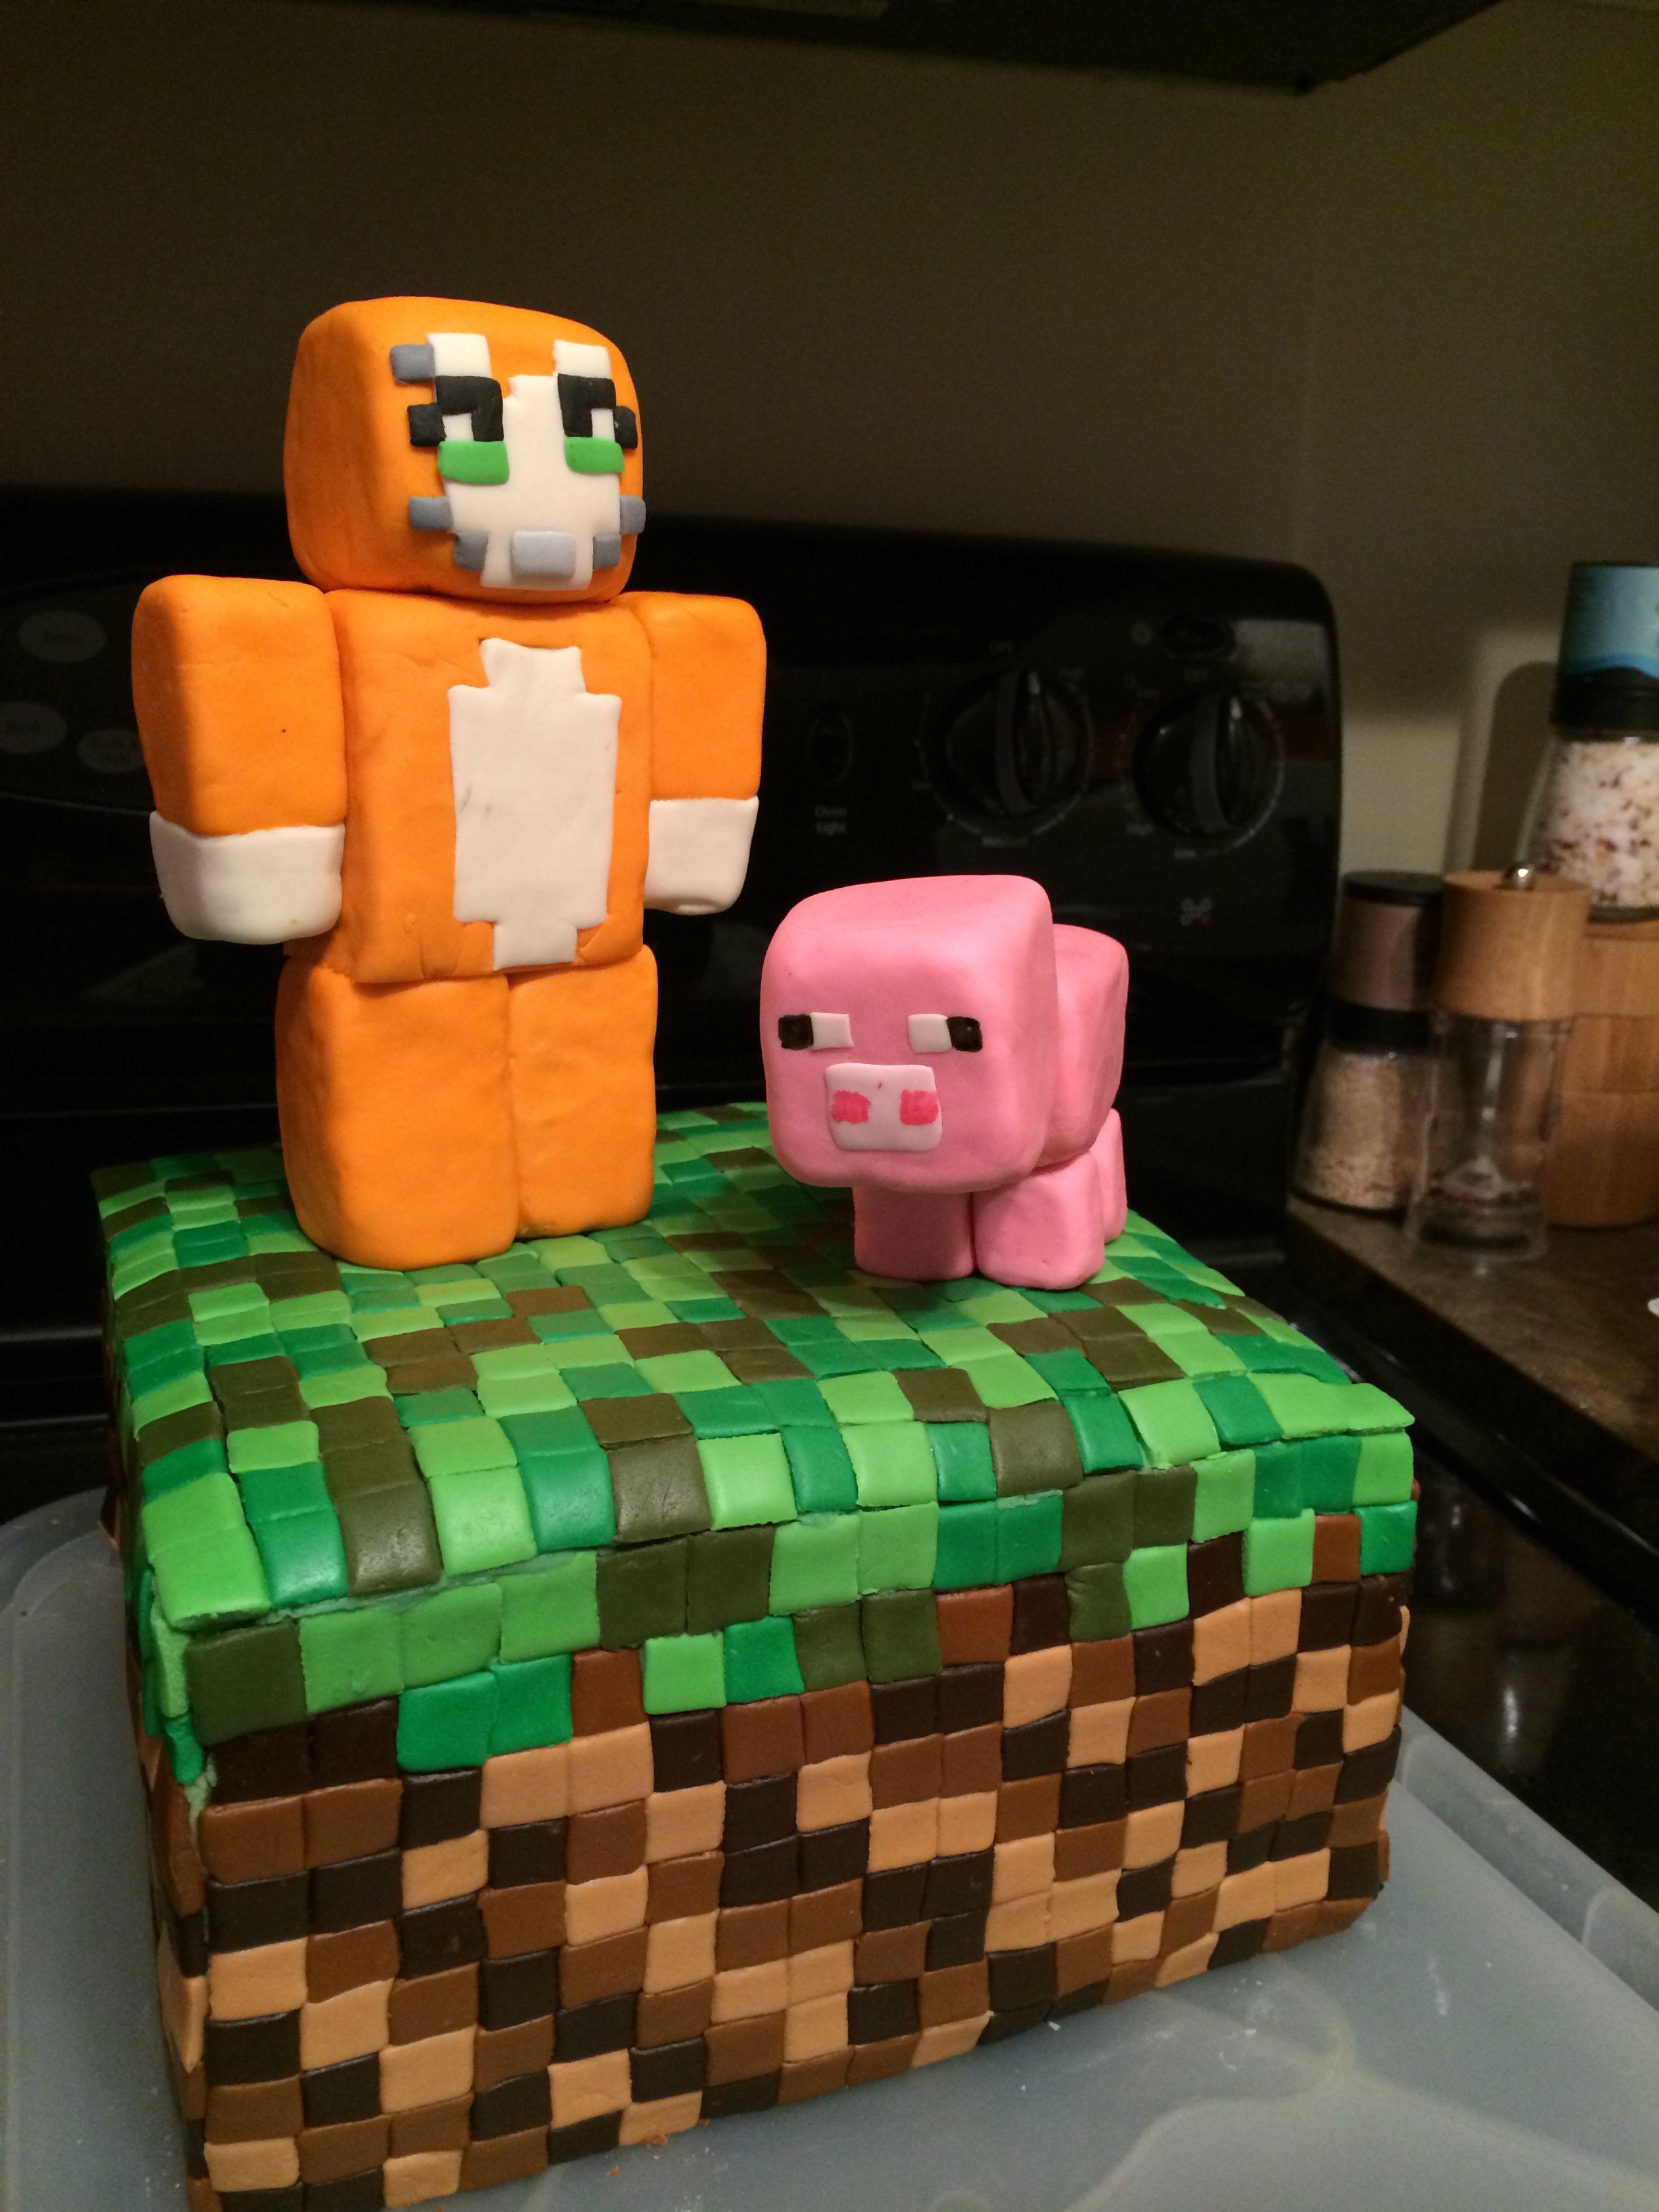 Stampy Longnose Minecraft Birthday Cake For My Son